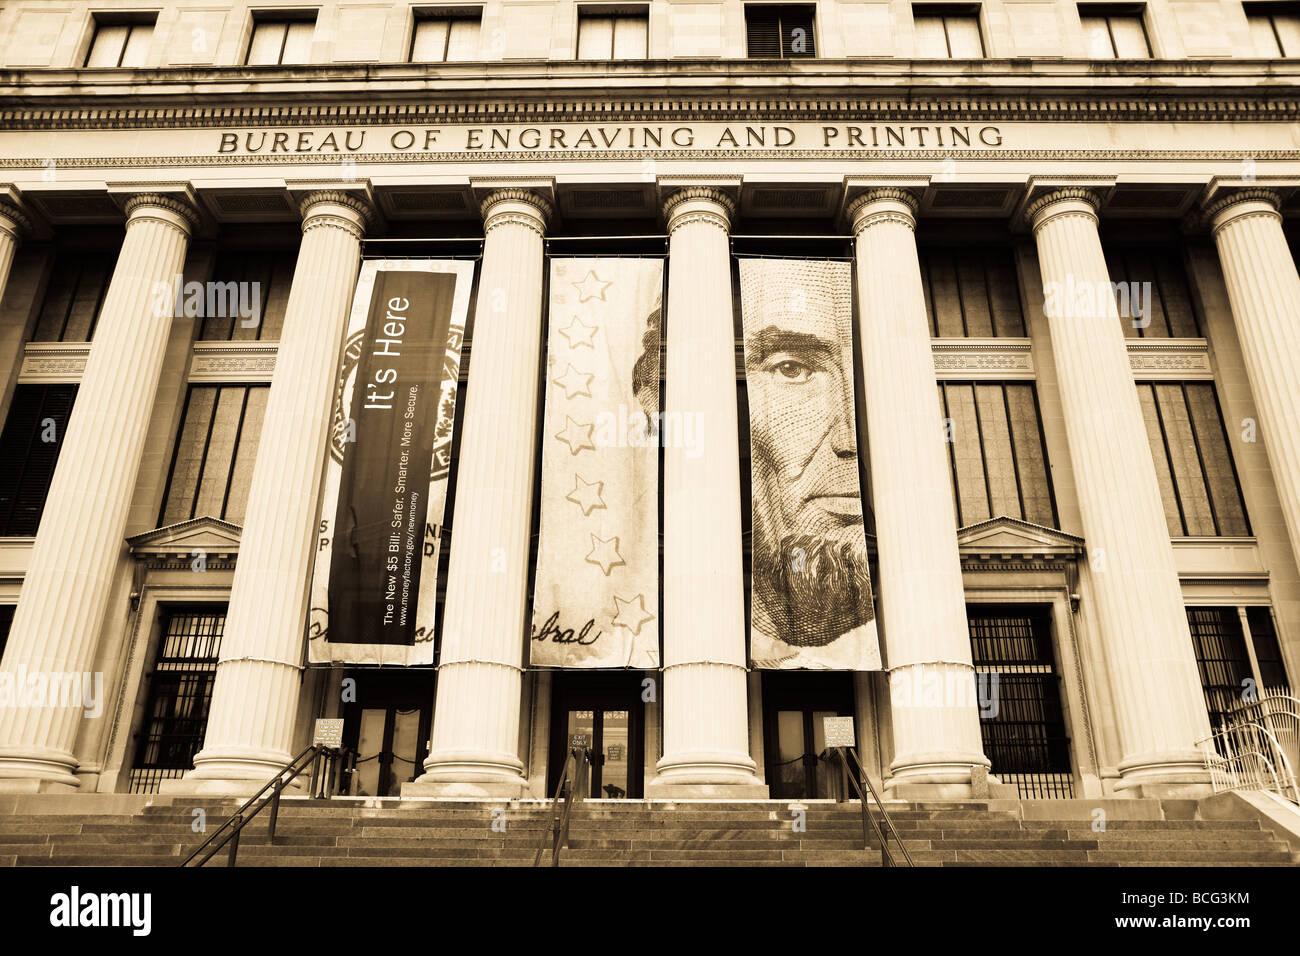 Bureau of engraving and printing washington dc usa stock photo